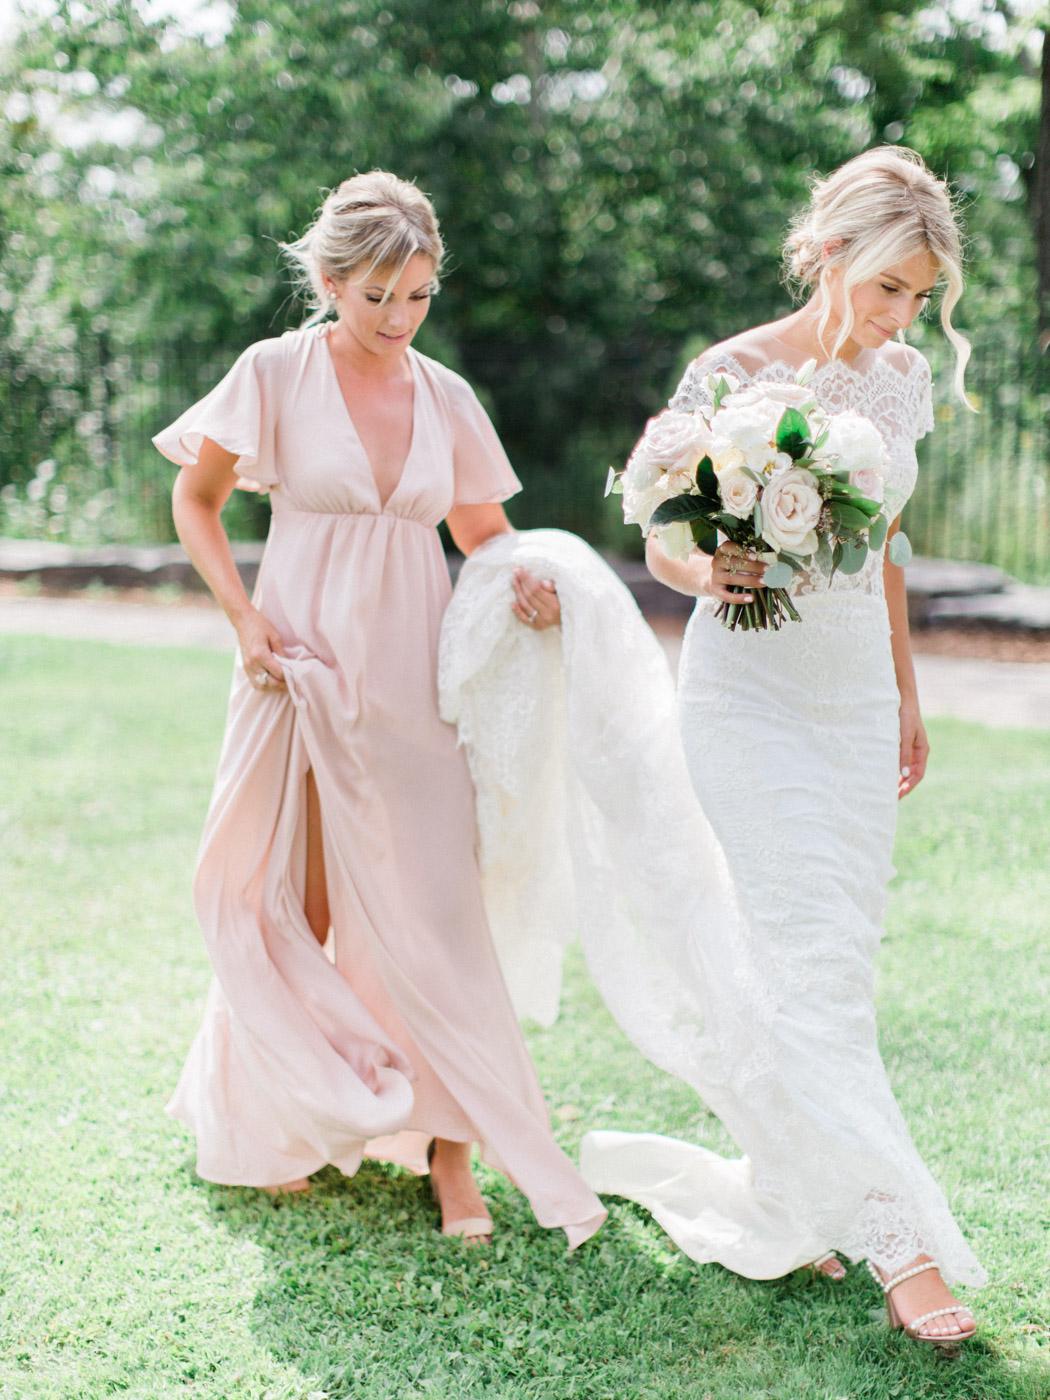 Toronto-Muskoka-wedding-photographer-summery-fun-documentary-the-marriott-rosseau49.jpg